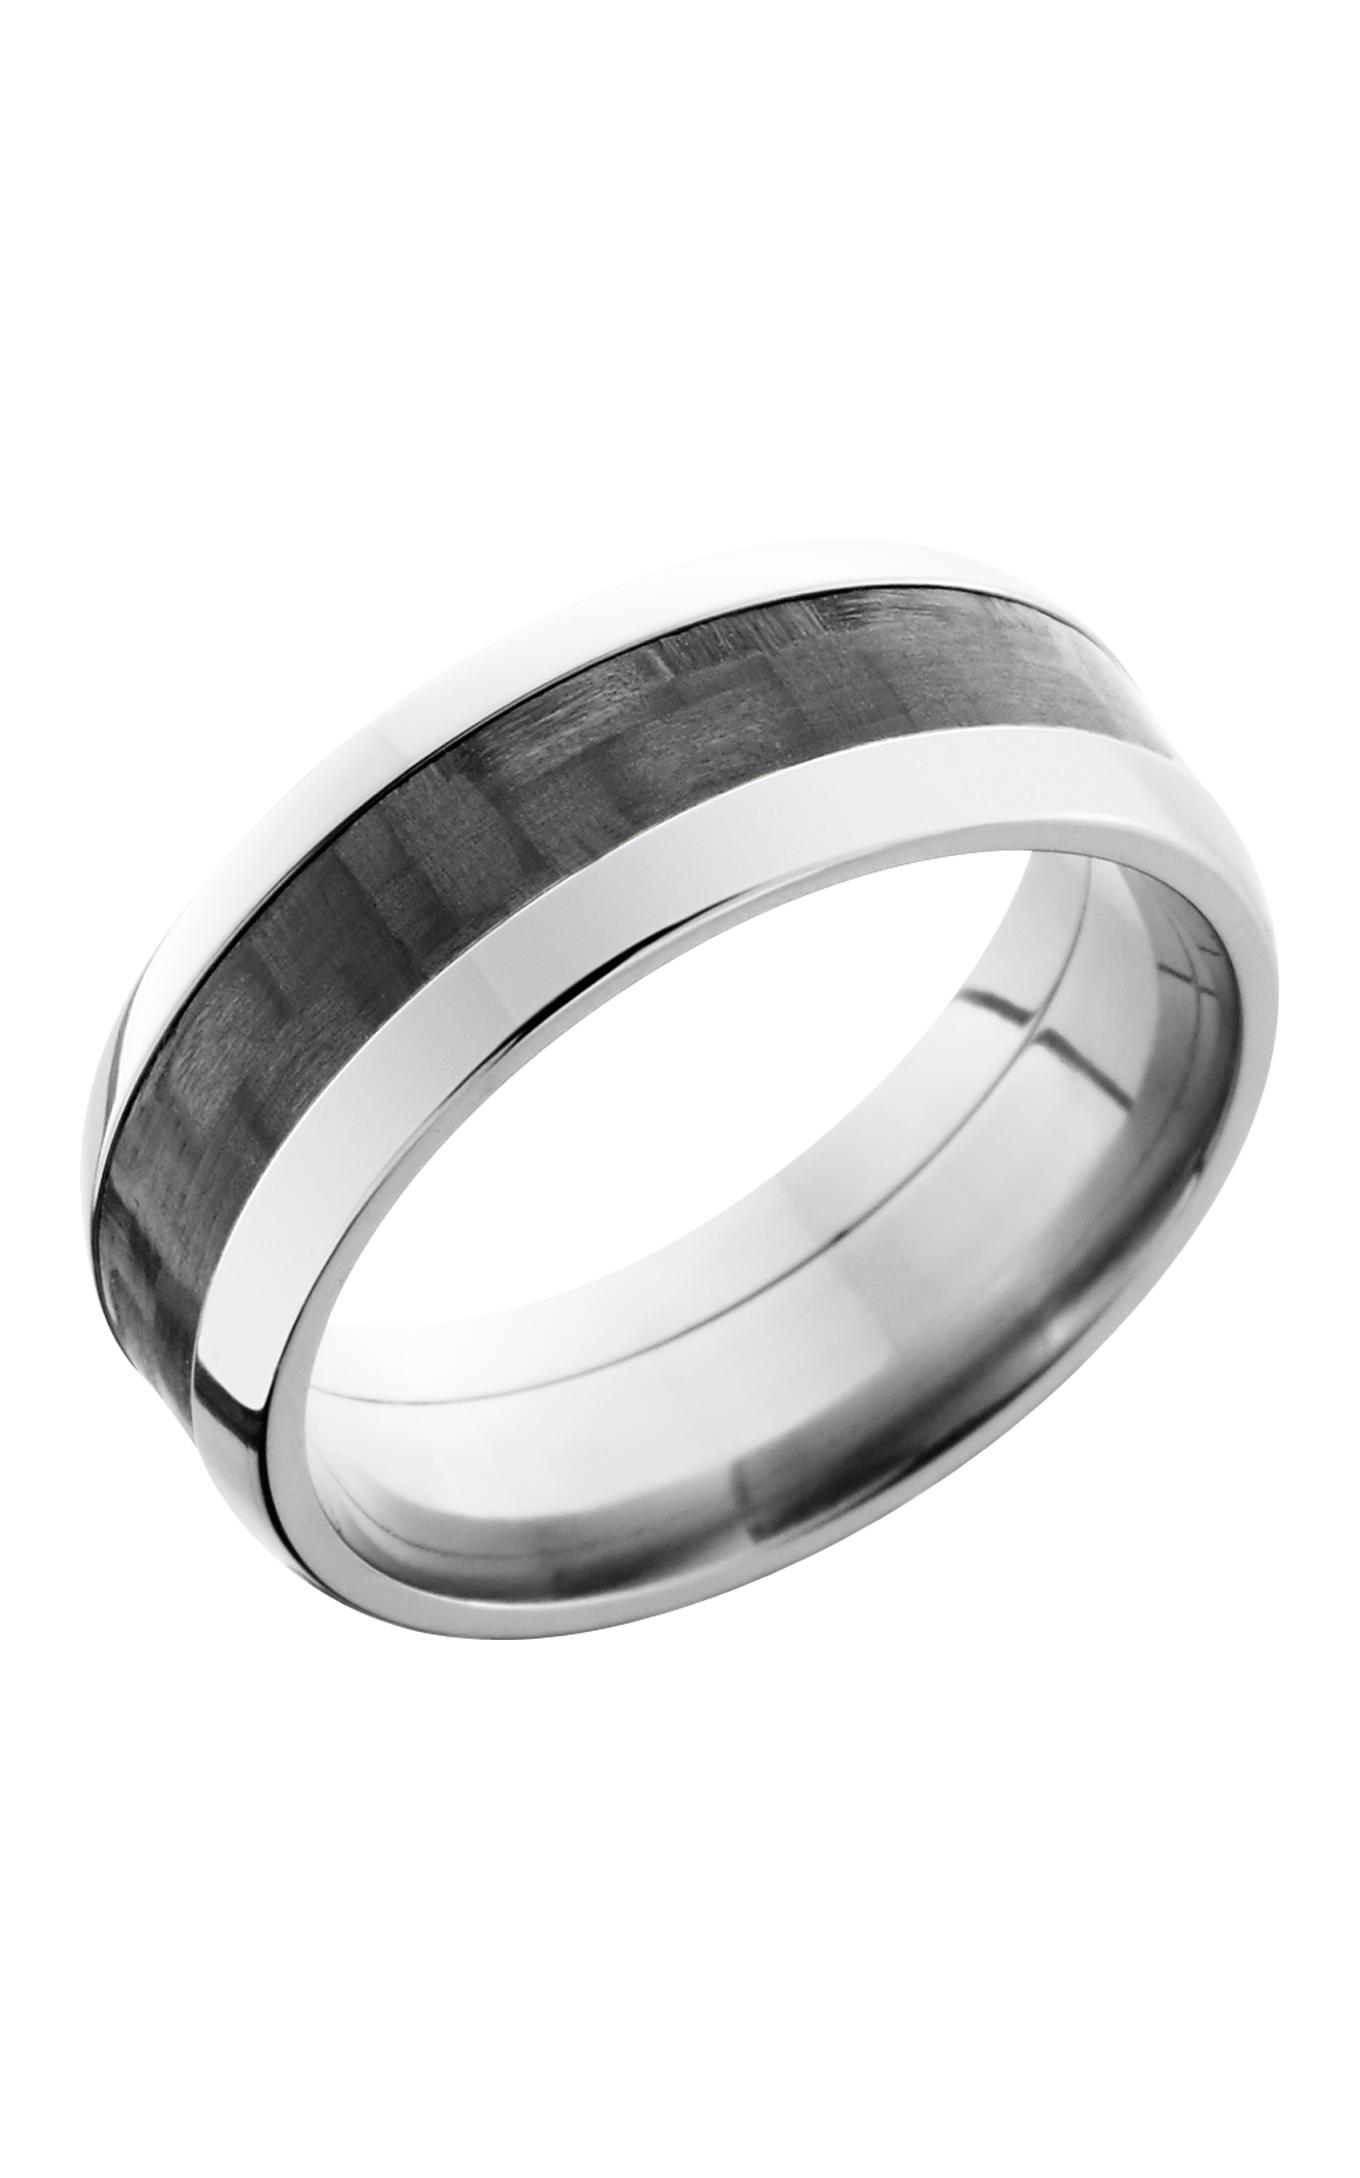 Lashbrook Carbon Fiber Wedding band C8D14 CF POLISH product image